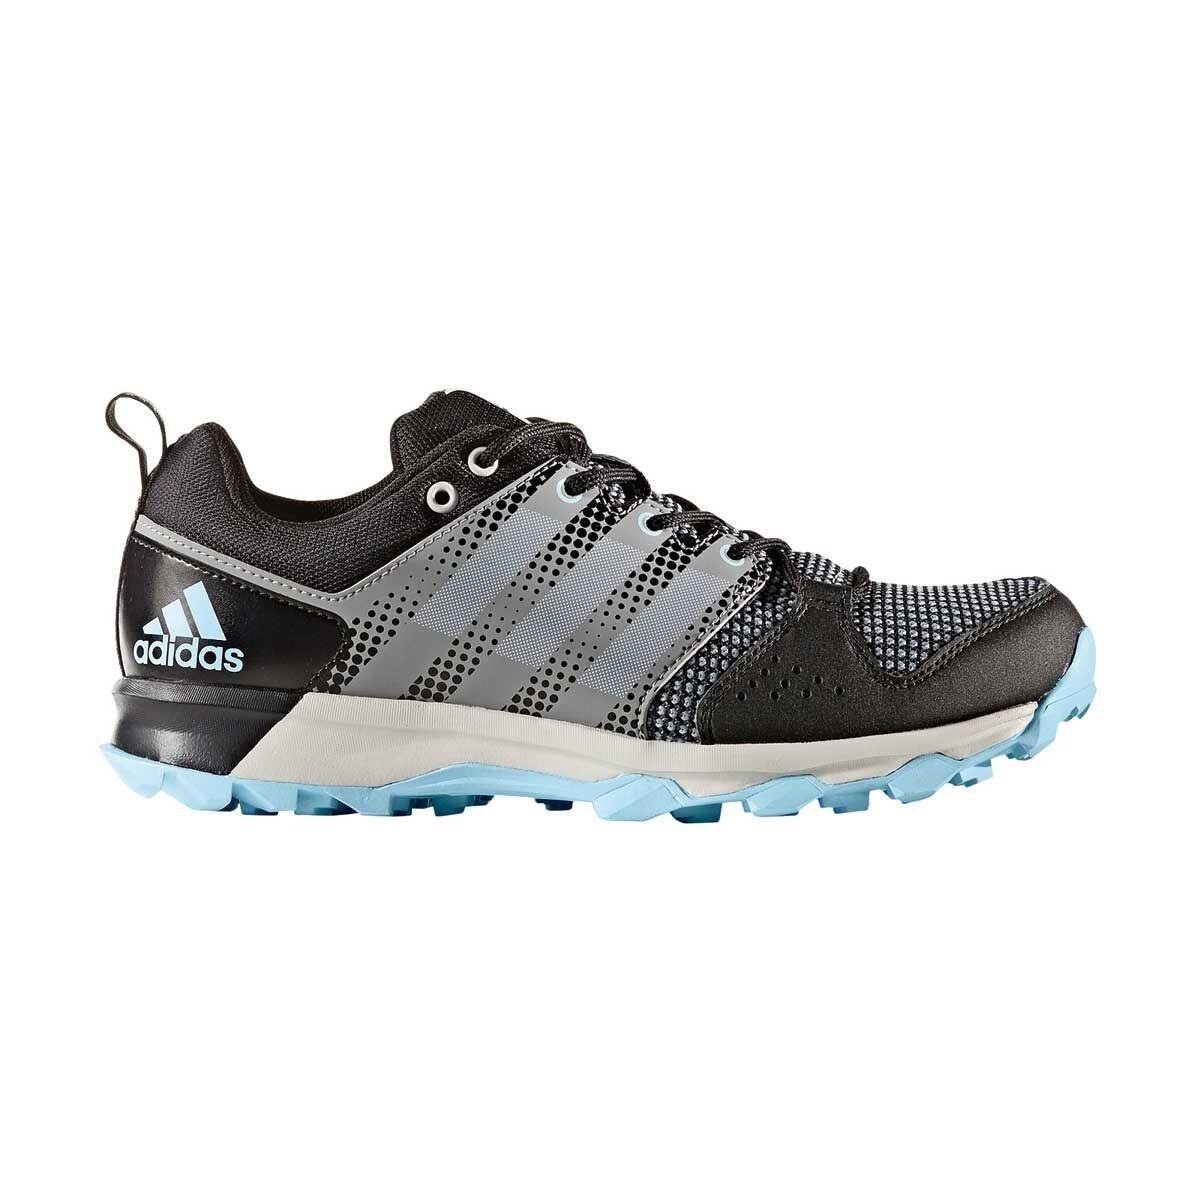 7 Trail Womens US Shoes Black Blue Running 5 Galaxy adidas Trail gnxAO6xz